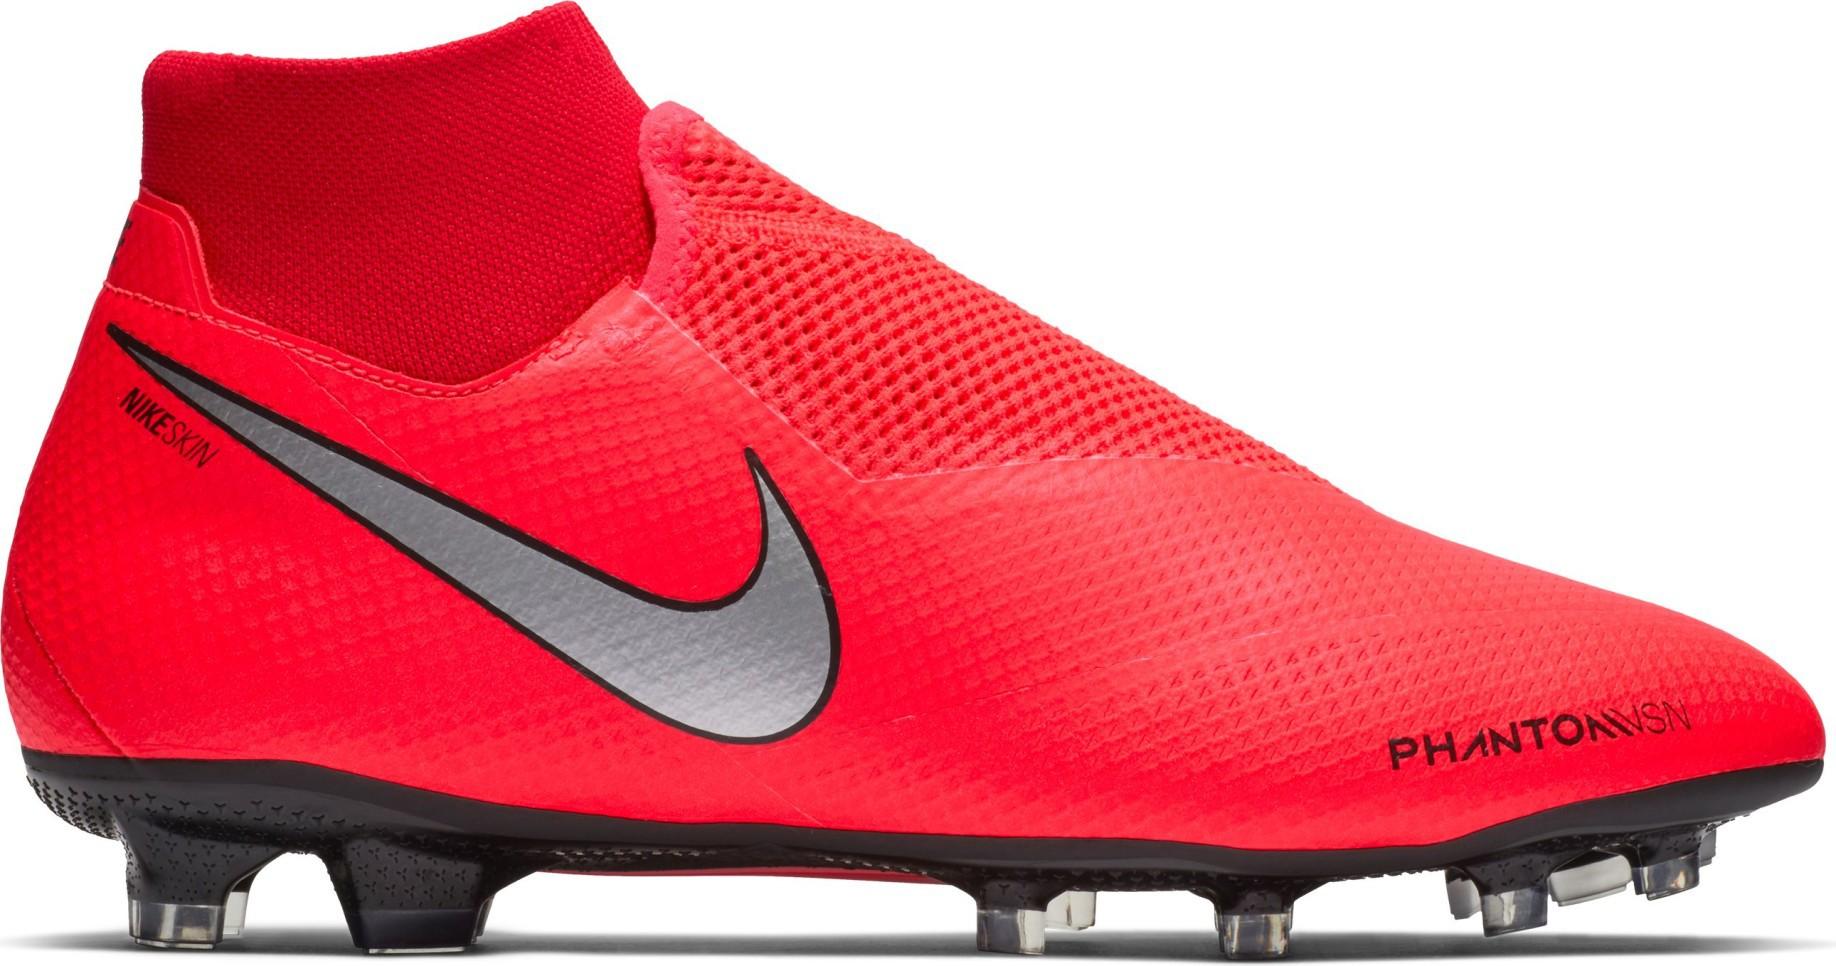 san francisco 28edb e2b4c Nike Football boots Phantom Vision Pro FG Game Over Pack